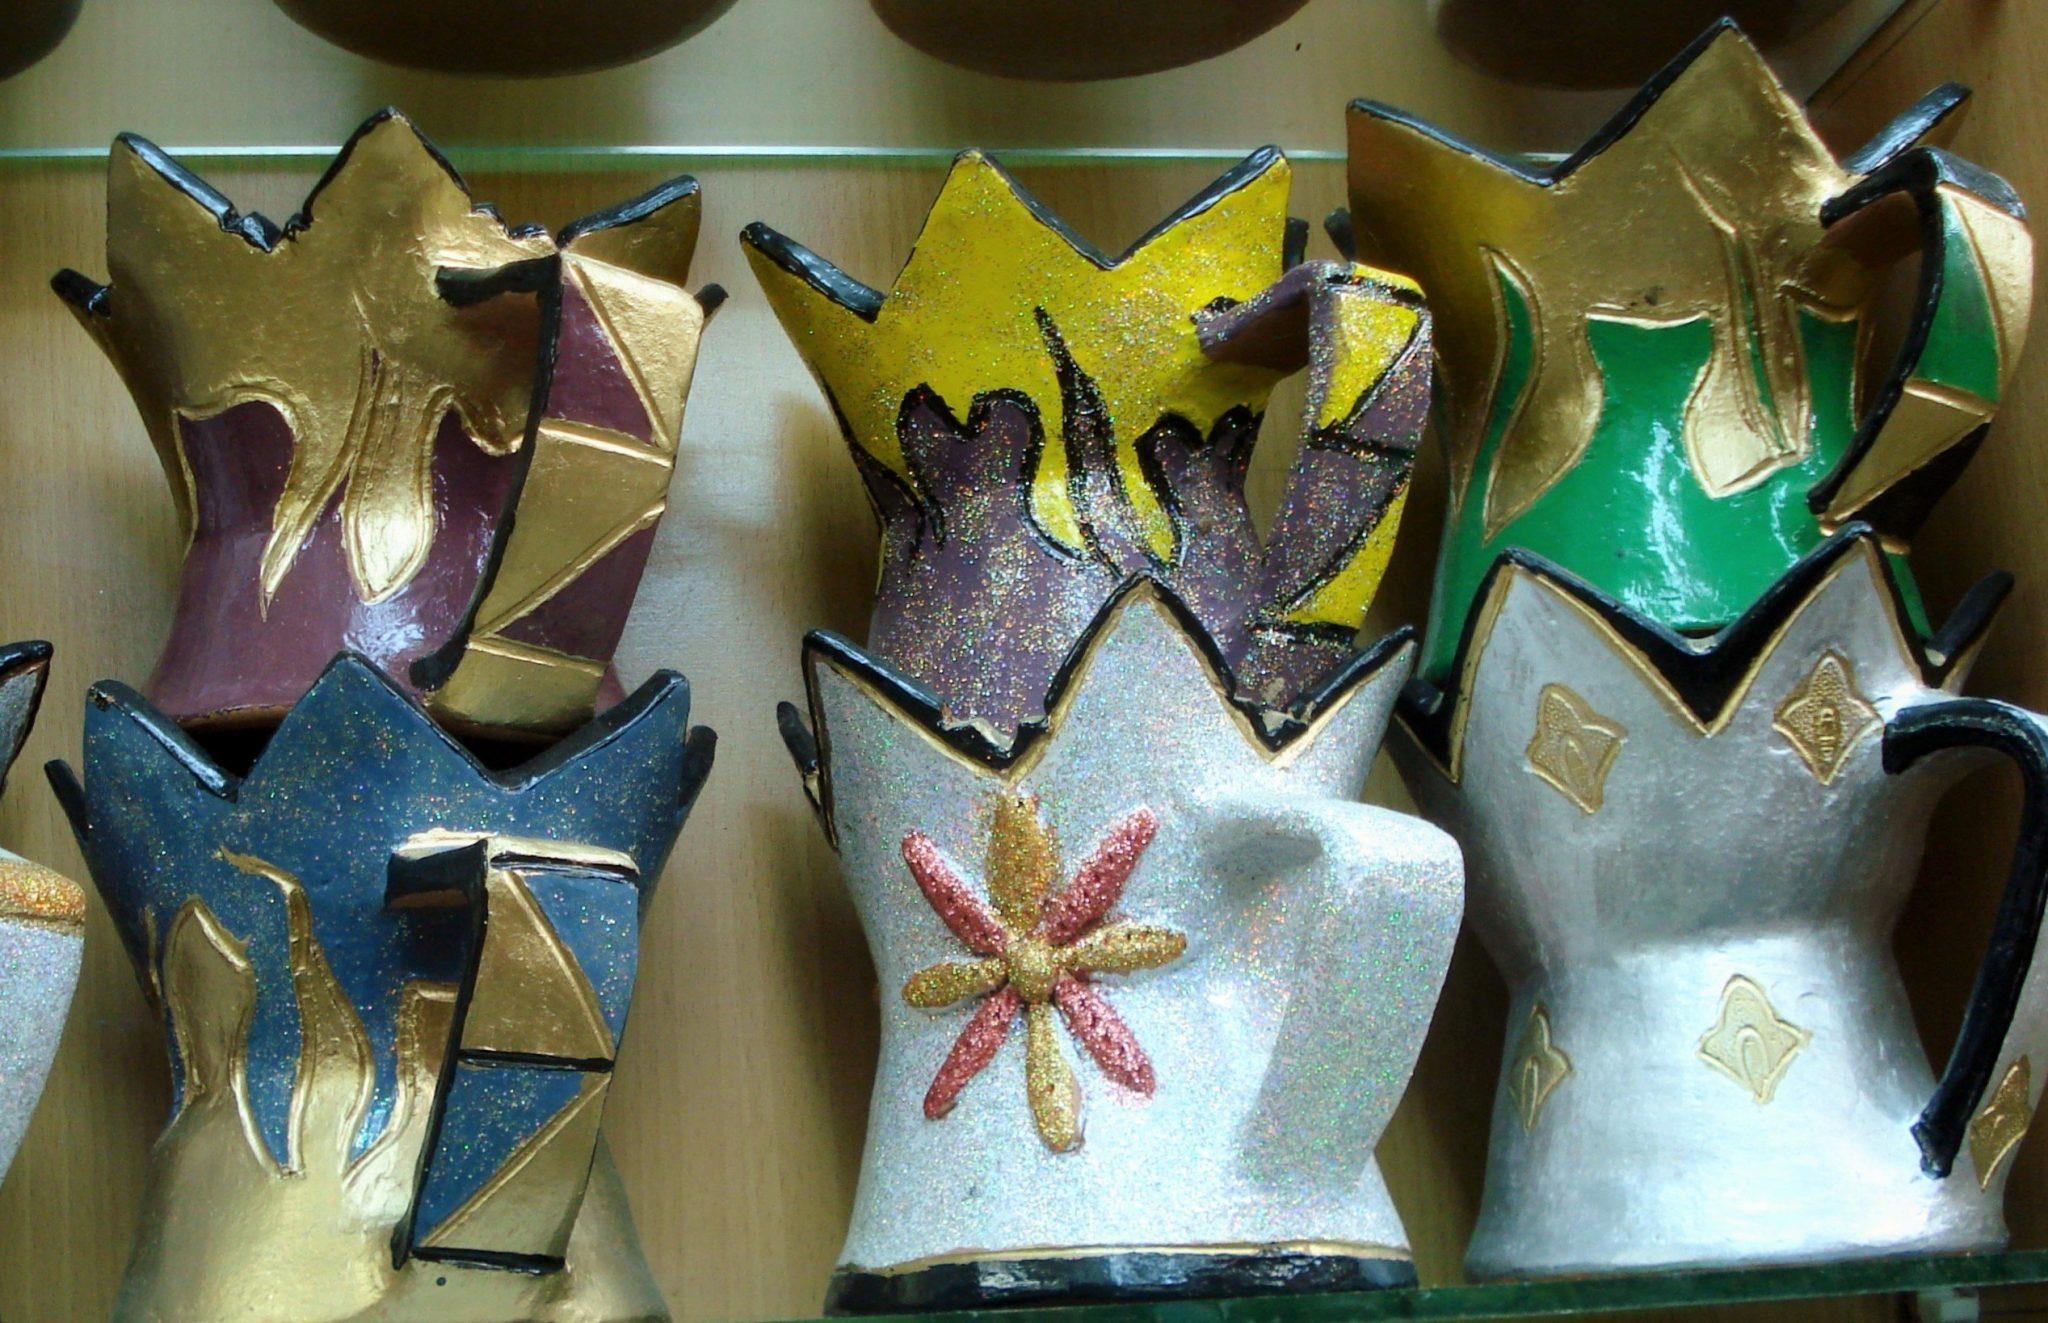 Colorful frankincense burners on a shelf